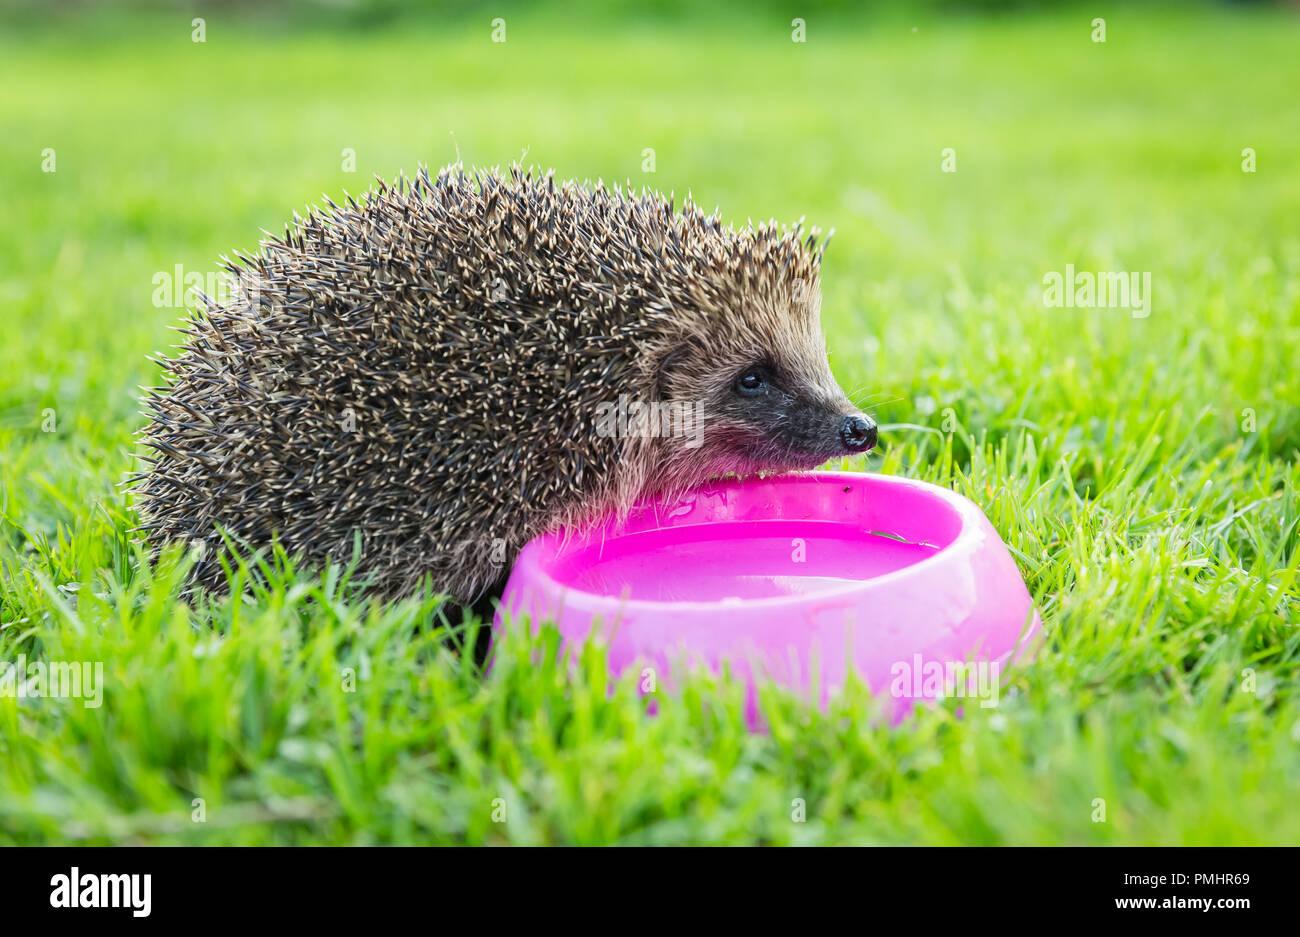 Hedgehog, wild, native hedgehog with pink bowl of water, facing right in natural garden habitat.  Scientific name: Erinaceus Europaeus. Horizontal - Stock Image